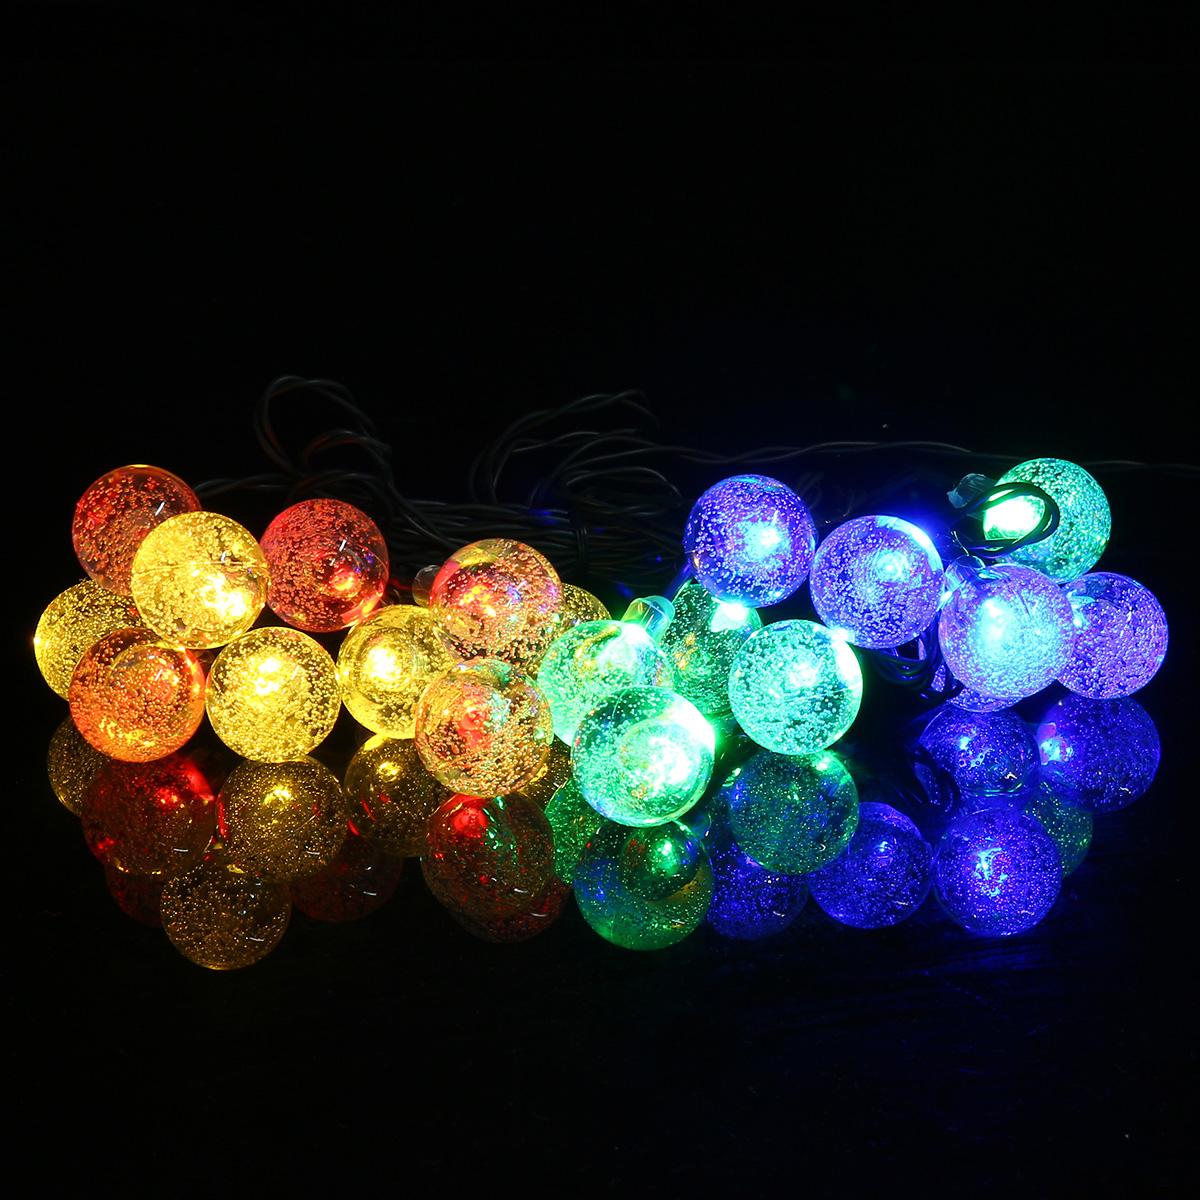 5/7/12m LED Solar Outdoor Waterproof Lamp 2.3cm Diameter Ball Shape Christmas Light String Balcony Garden Decoration Lights Christmas Decorations Clearance Christmas Lights